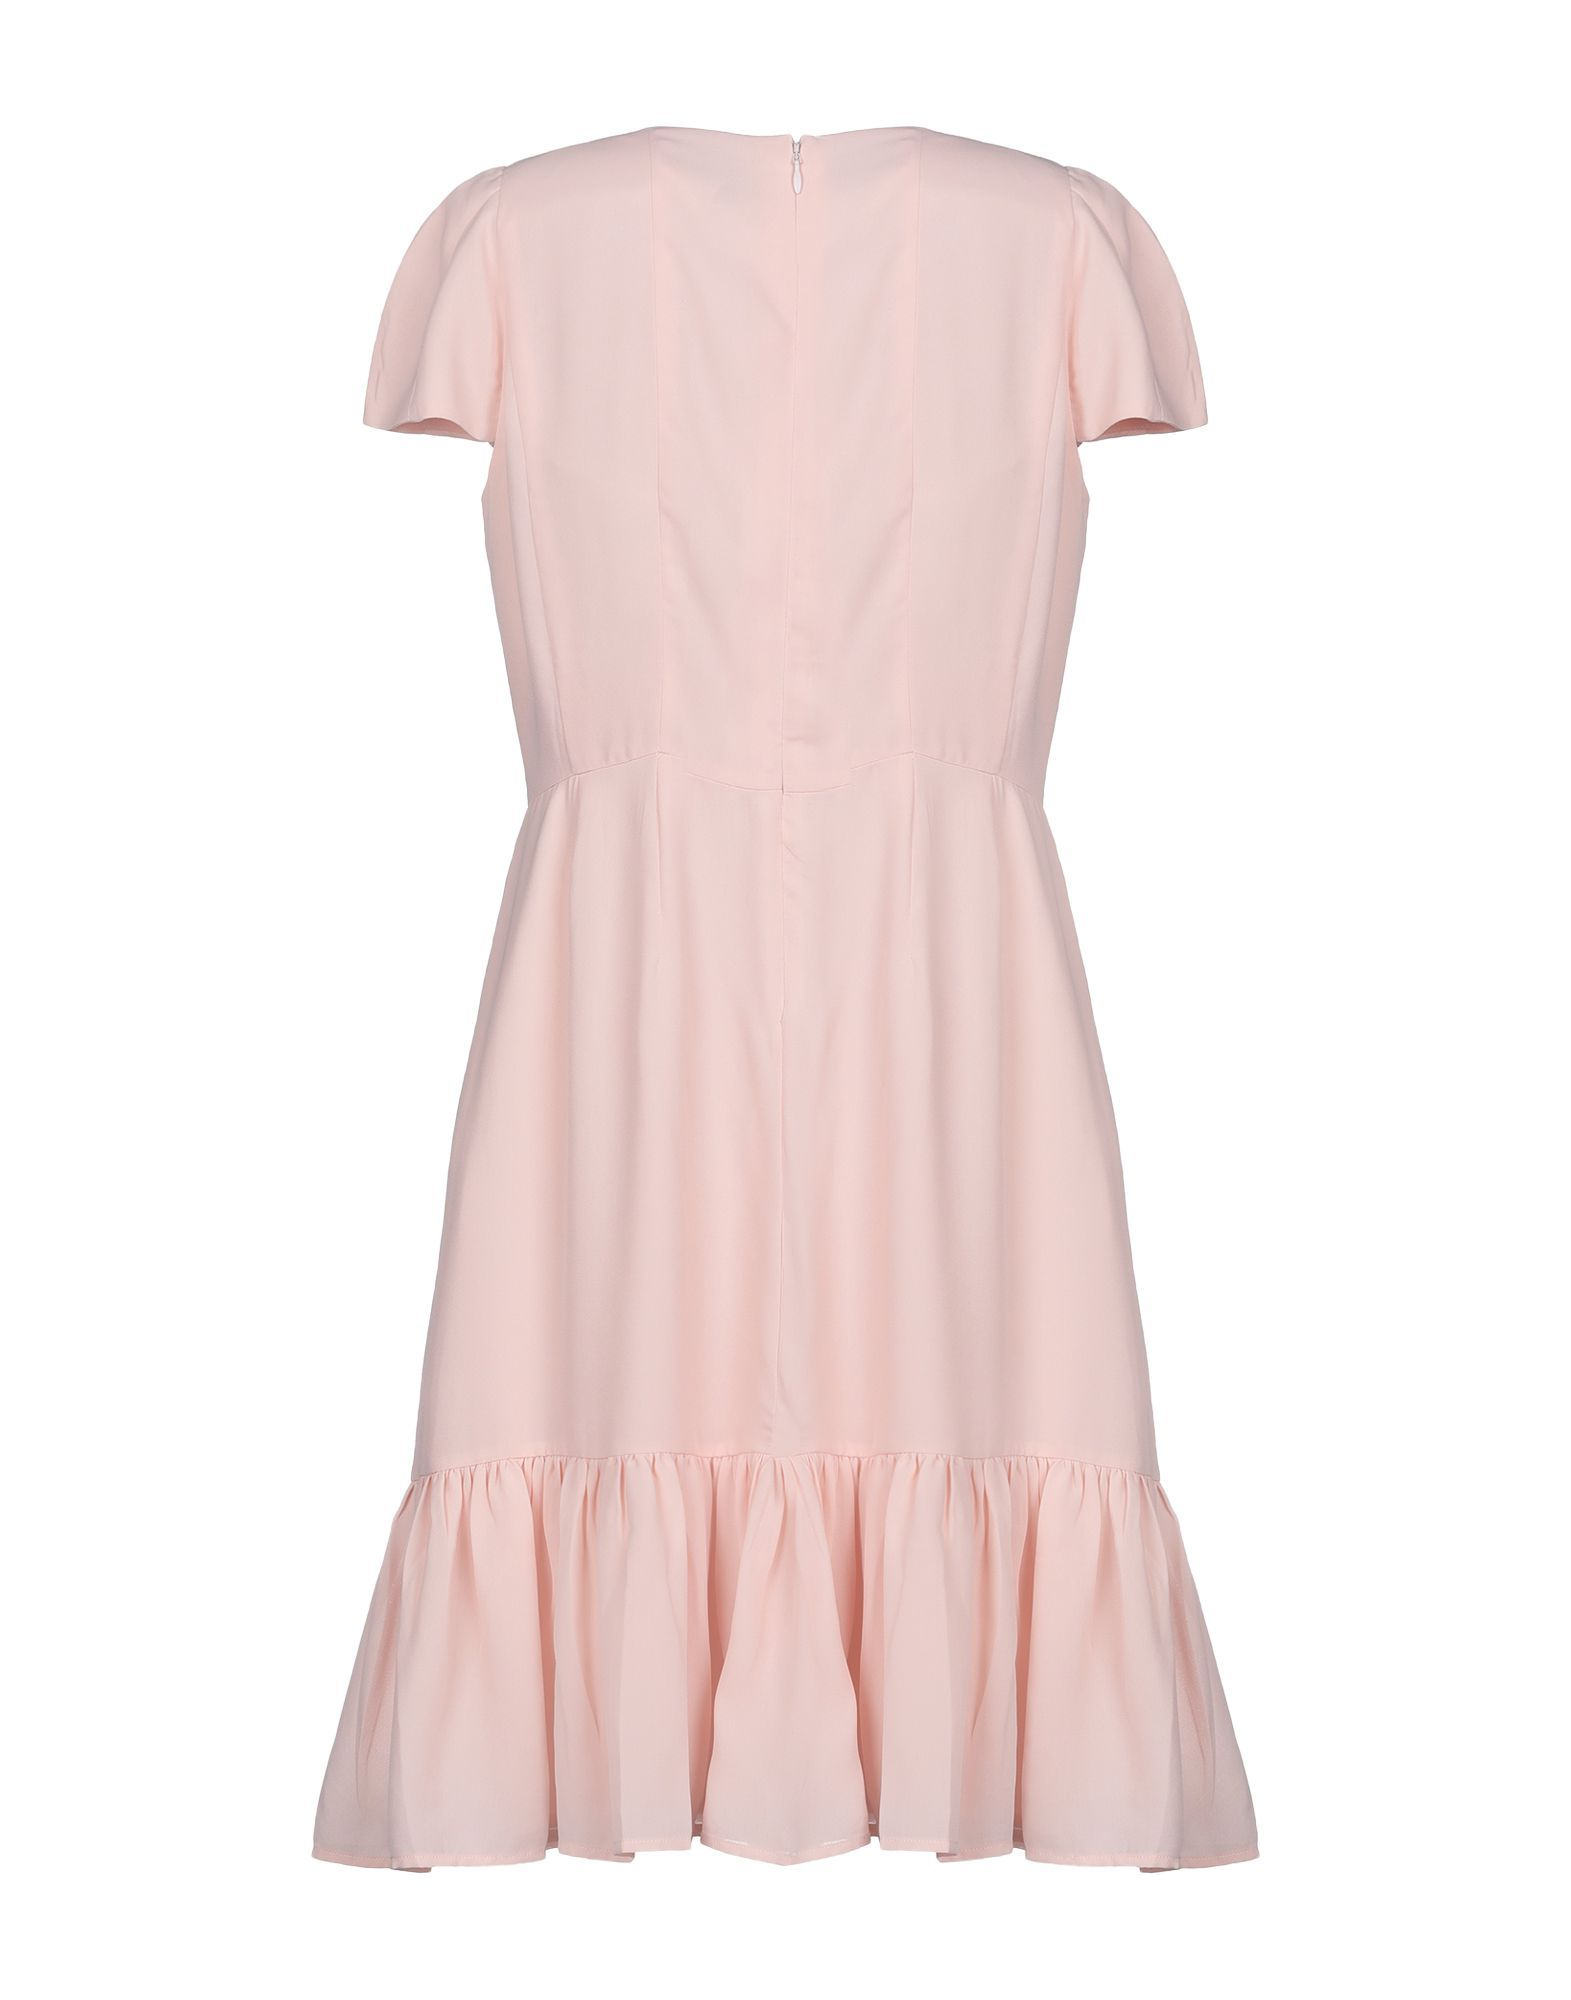 By Malina Pink Crepe Short Sleeve Dress